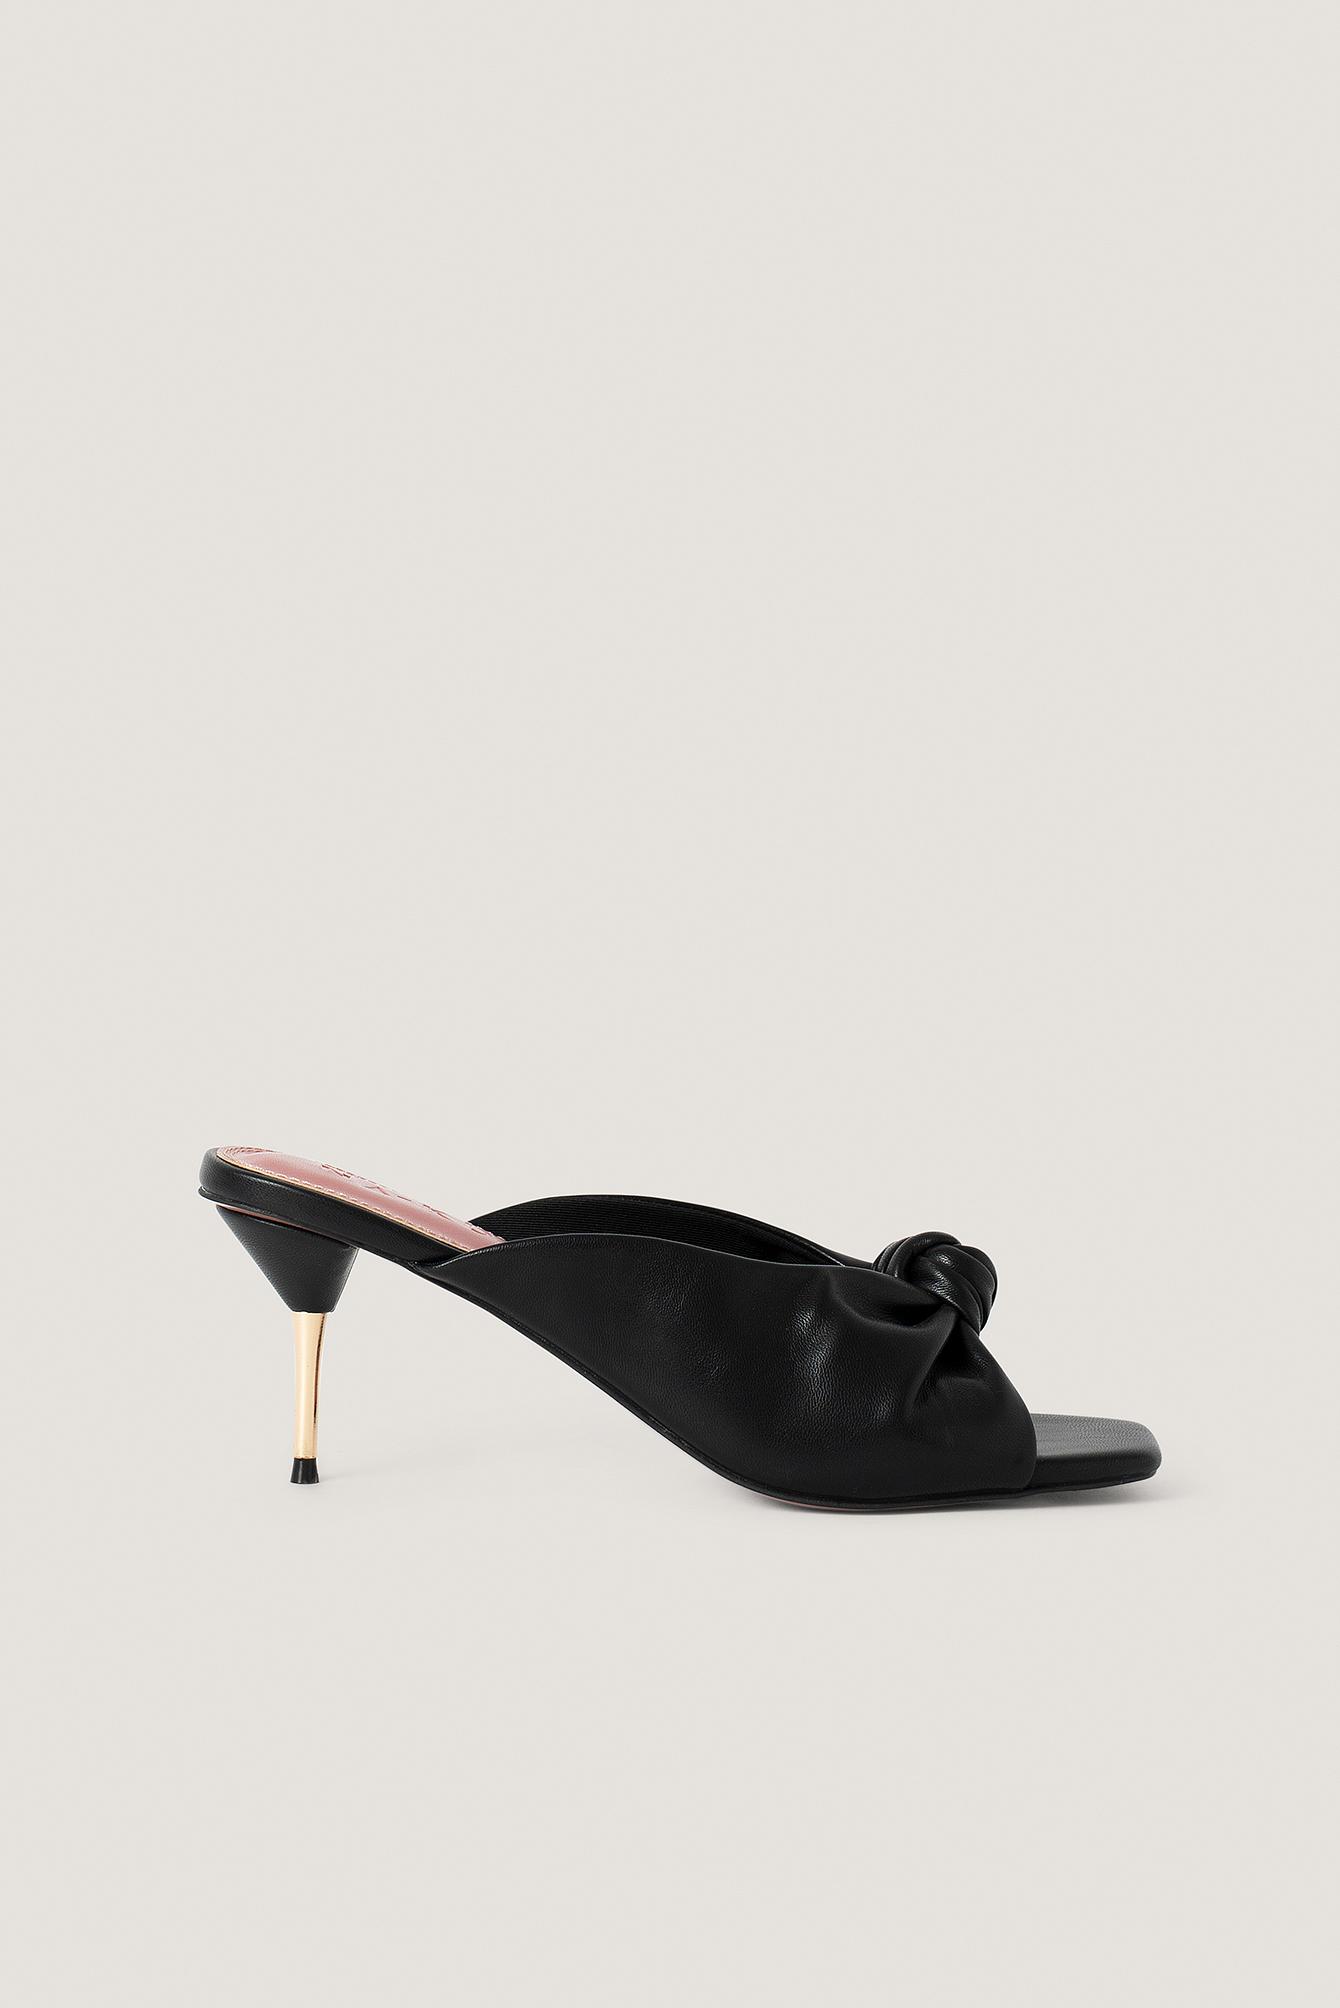 NA-KD Shoes Metal Heel Knot Mules - Black